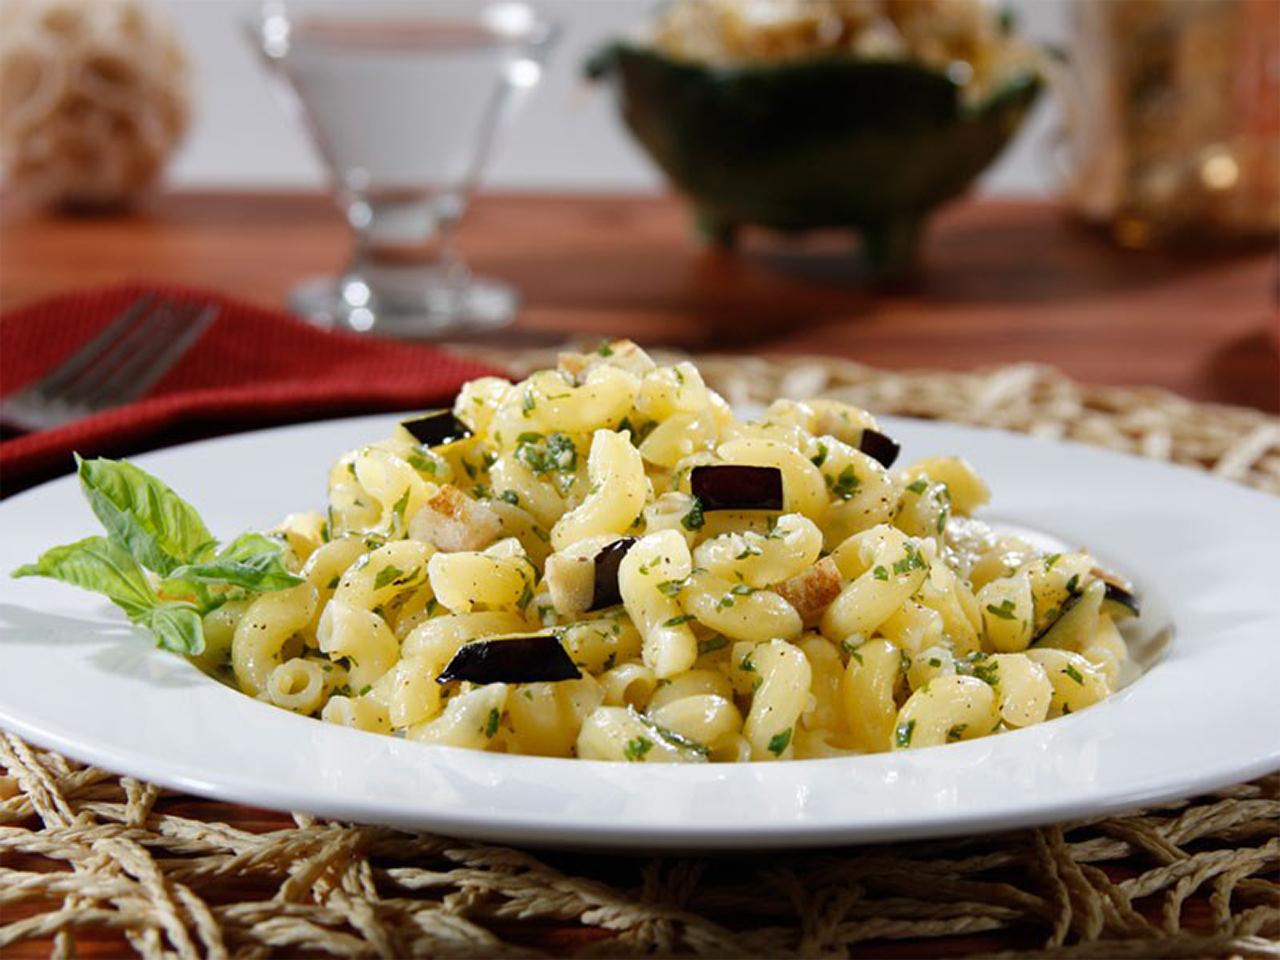 Barilla® Gluten Free Elbows Pasta Salad with Basil Pesto, Eggplant & Parmigiano